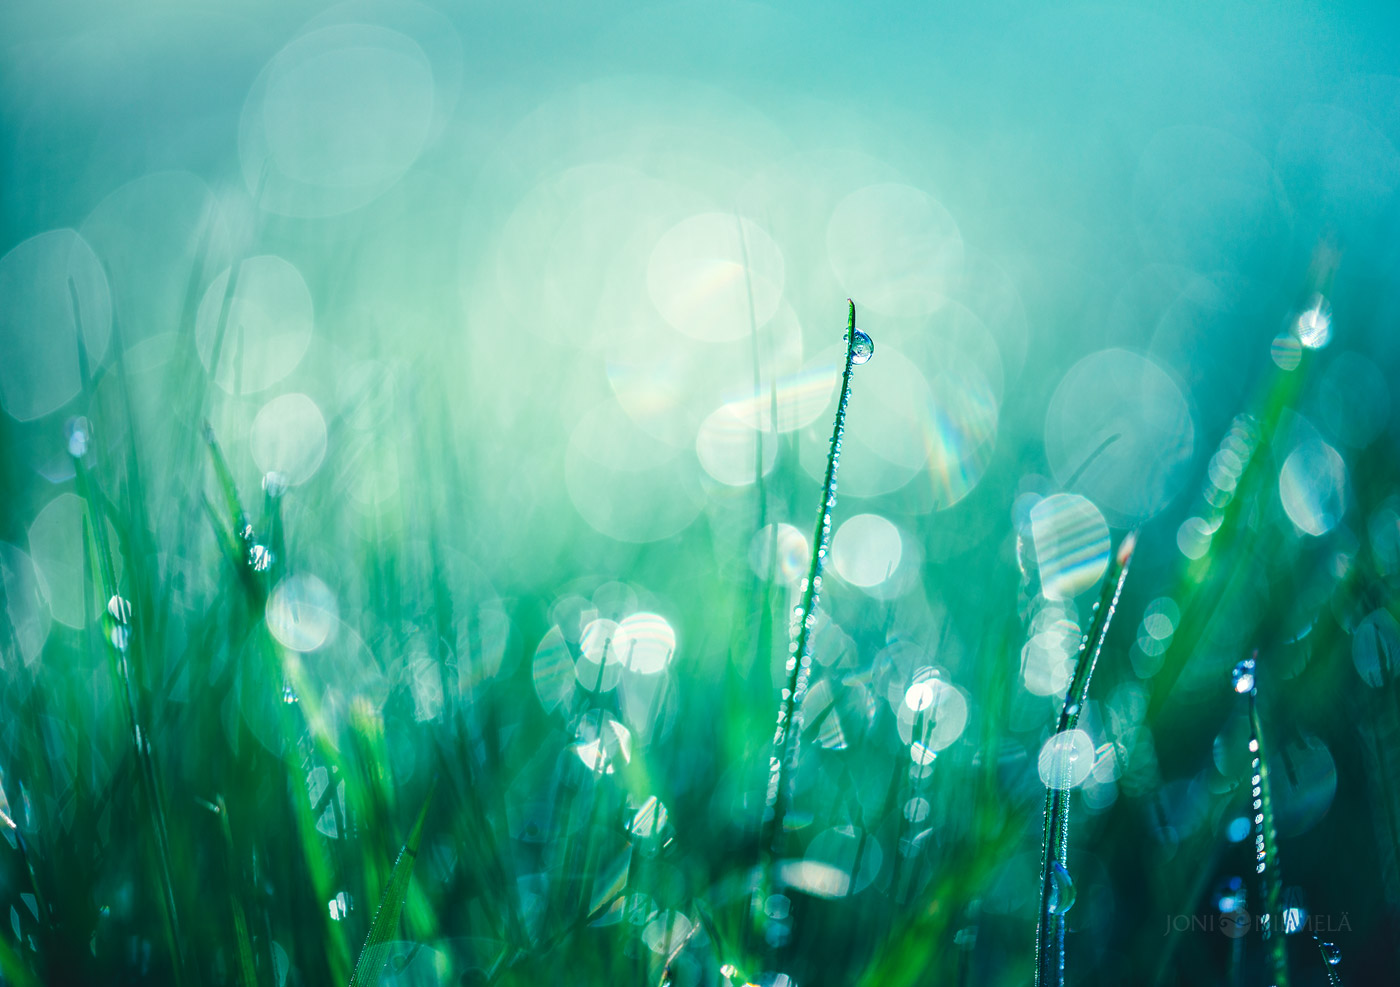 Frozen Morning Dew